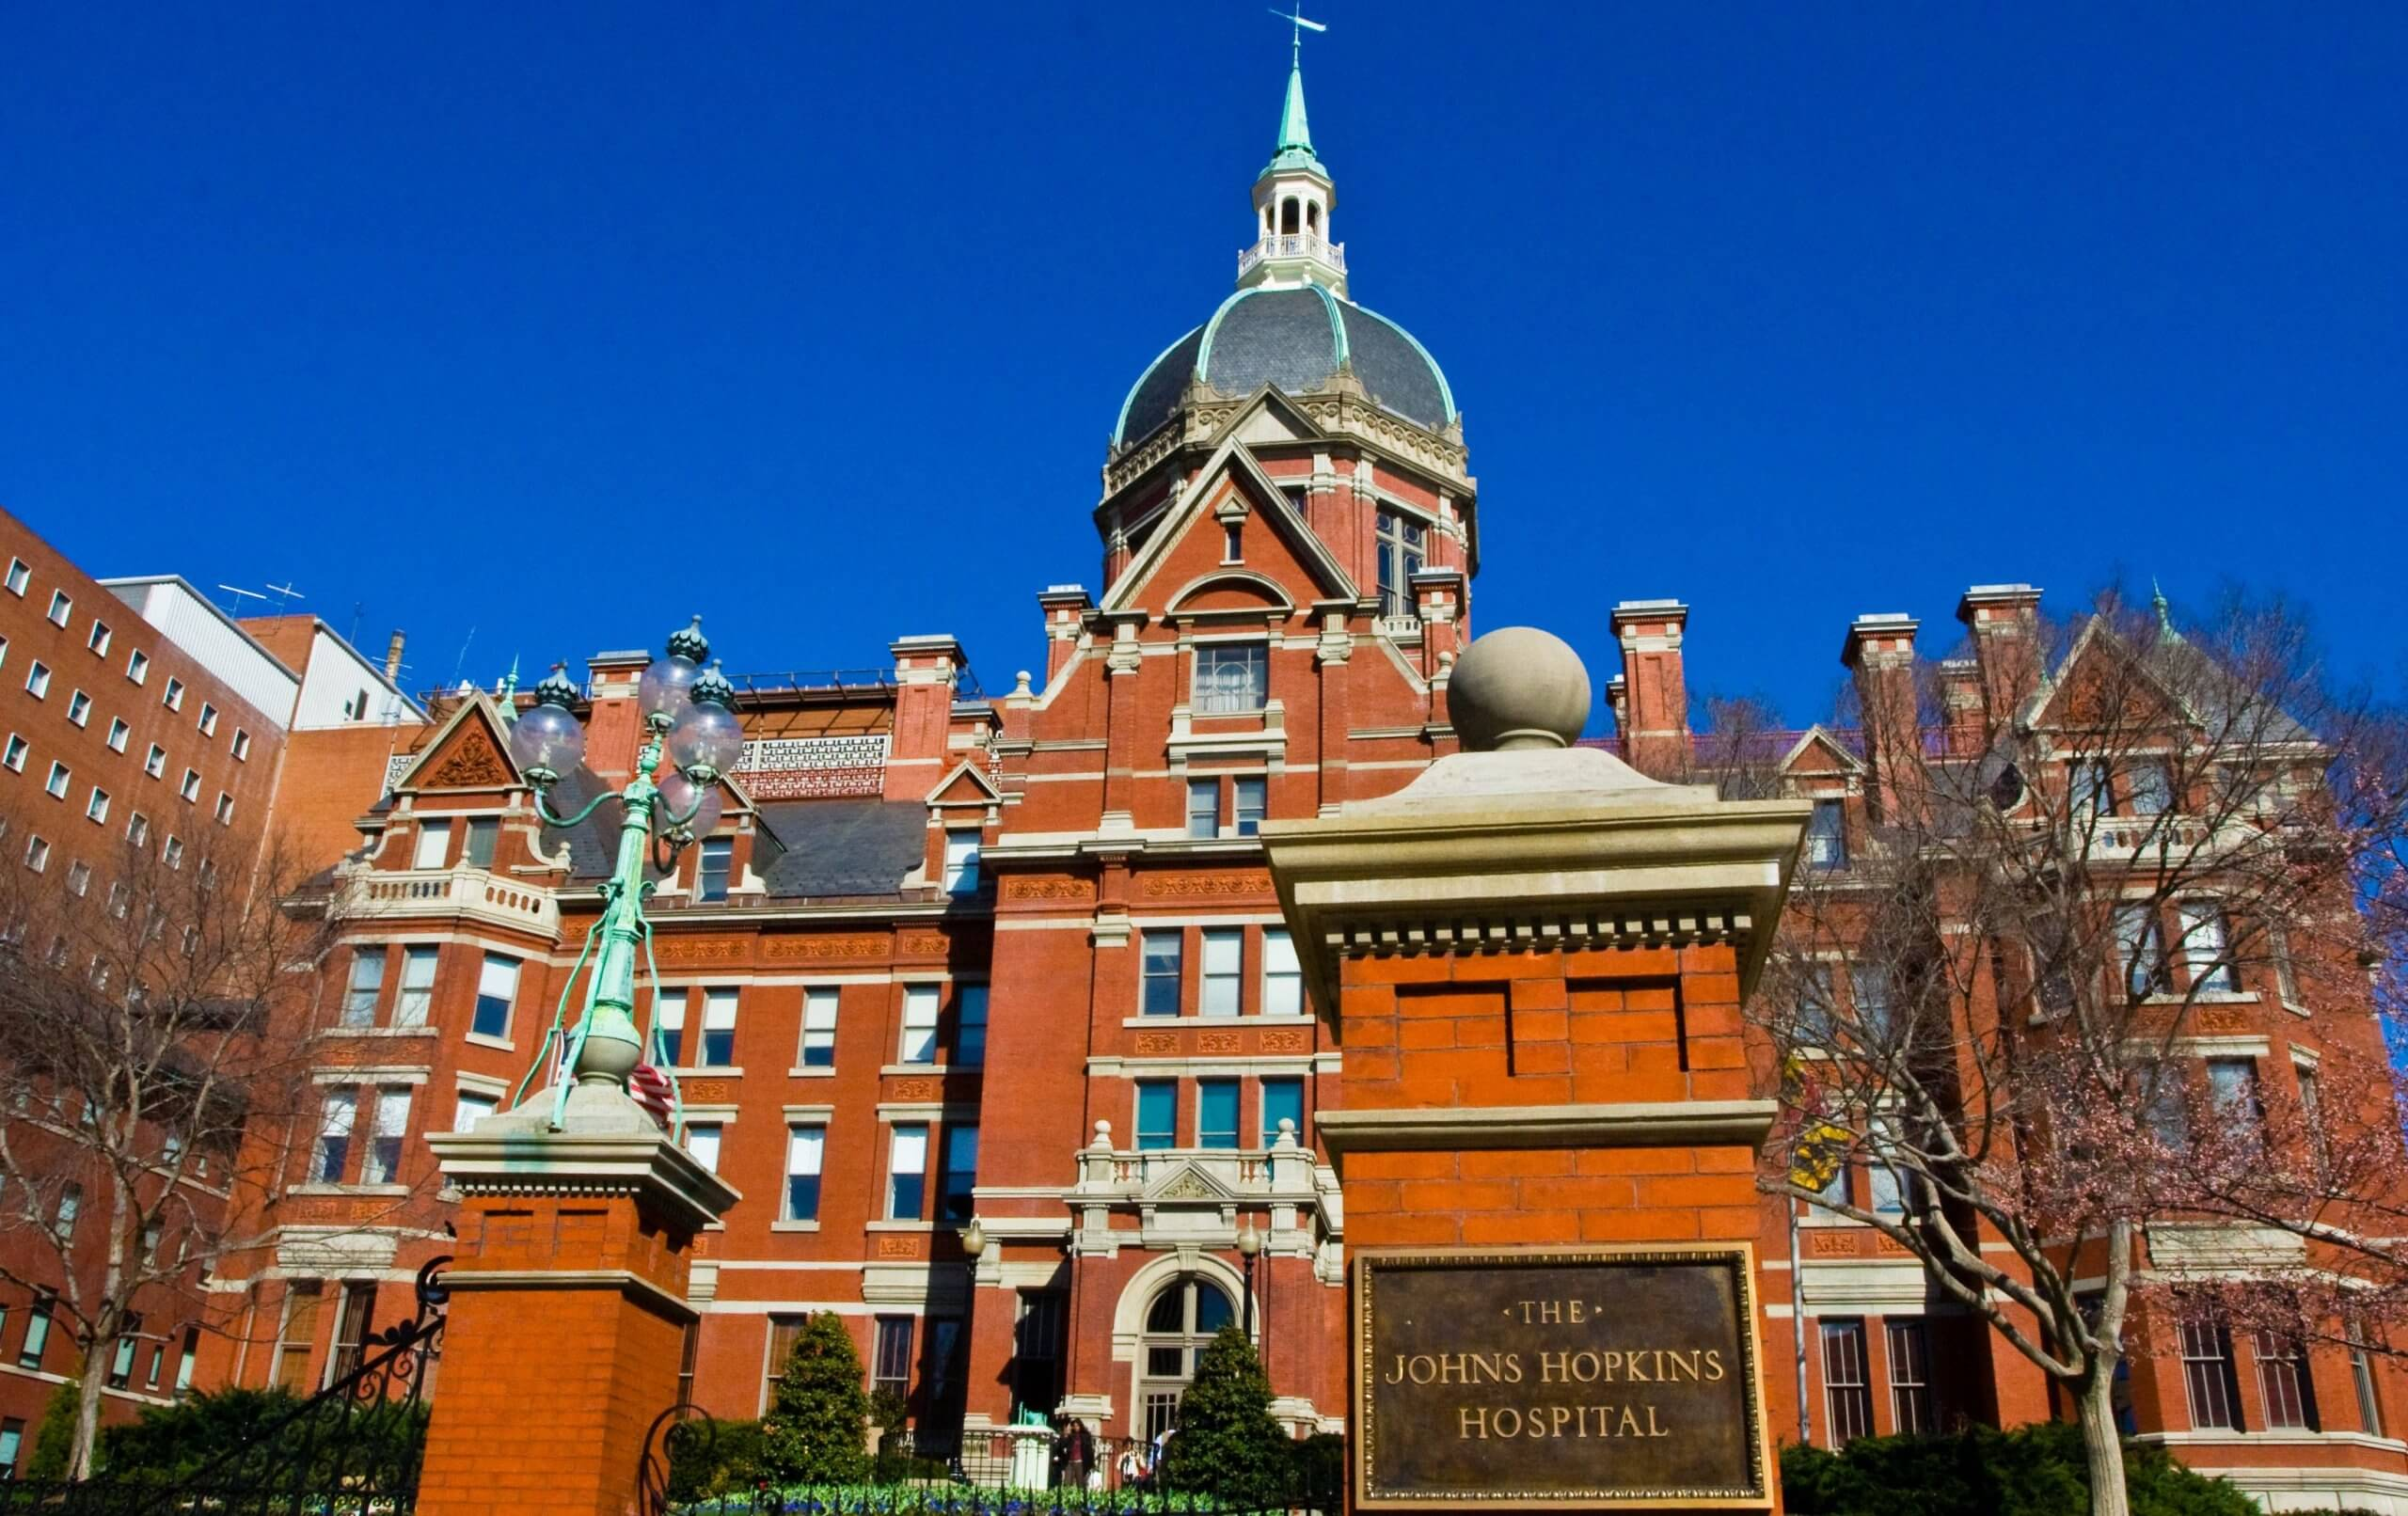 John Hopkins University Mattin Center to be Replaced